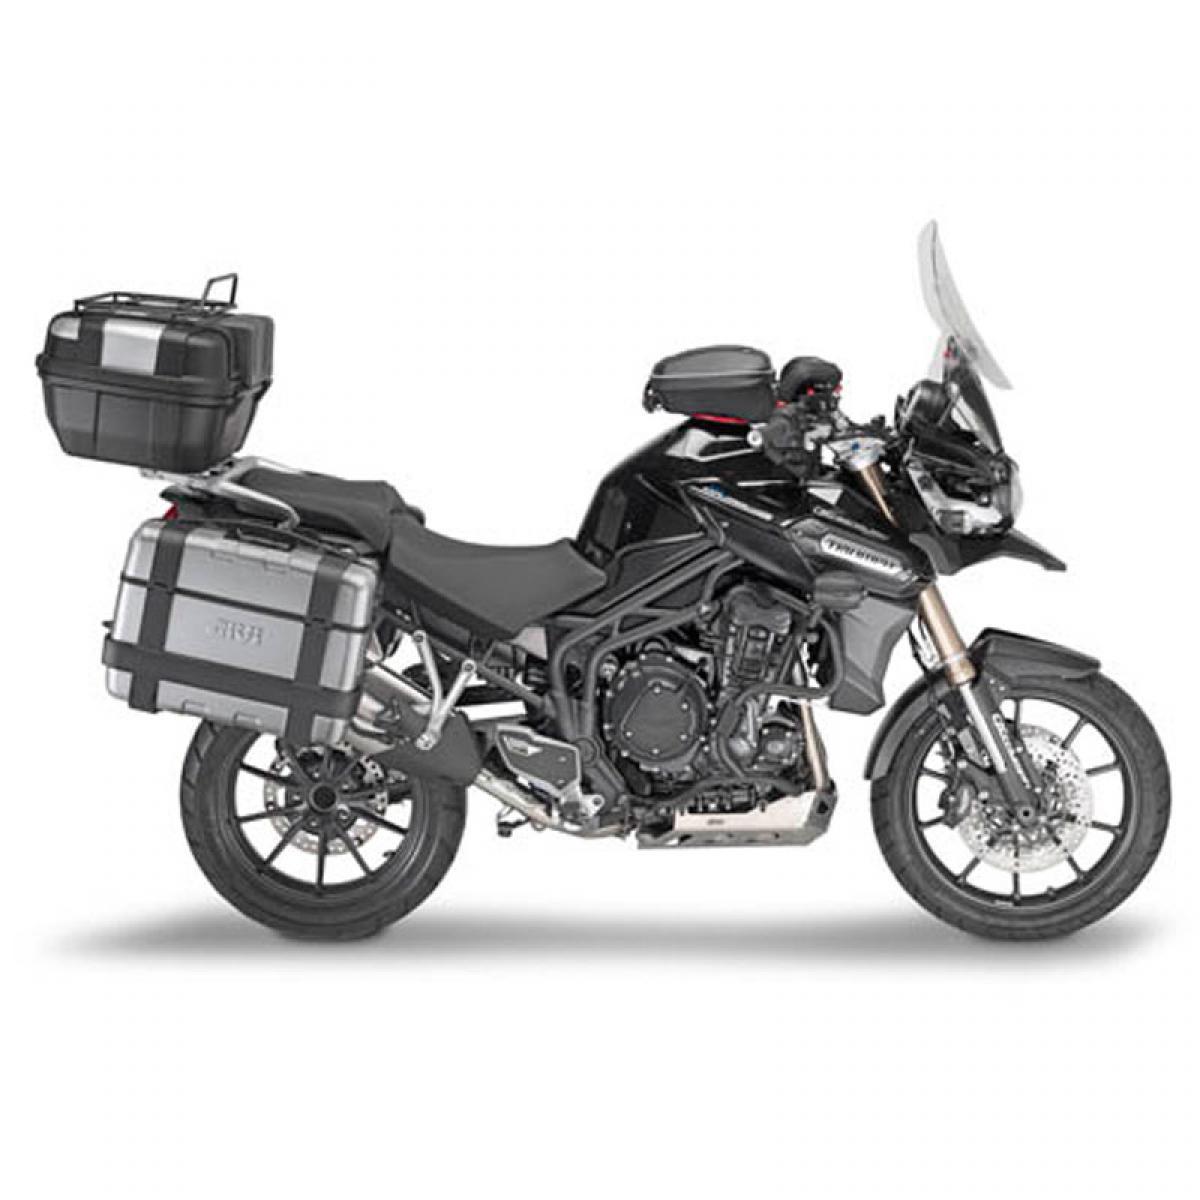 12-14 GIVI SR6403 Monokey Topcase Mounting Kit for Triumph Tiger Explorer 1200